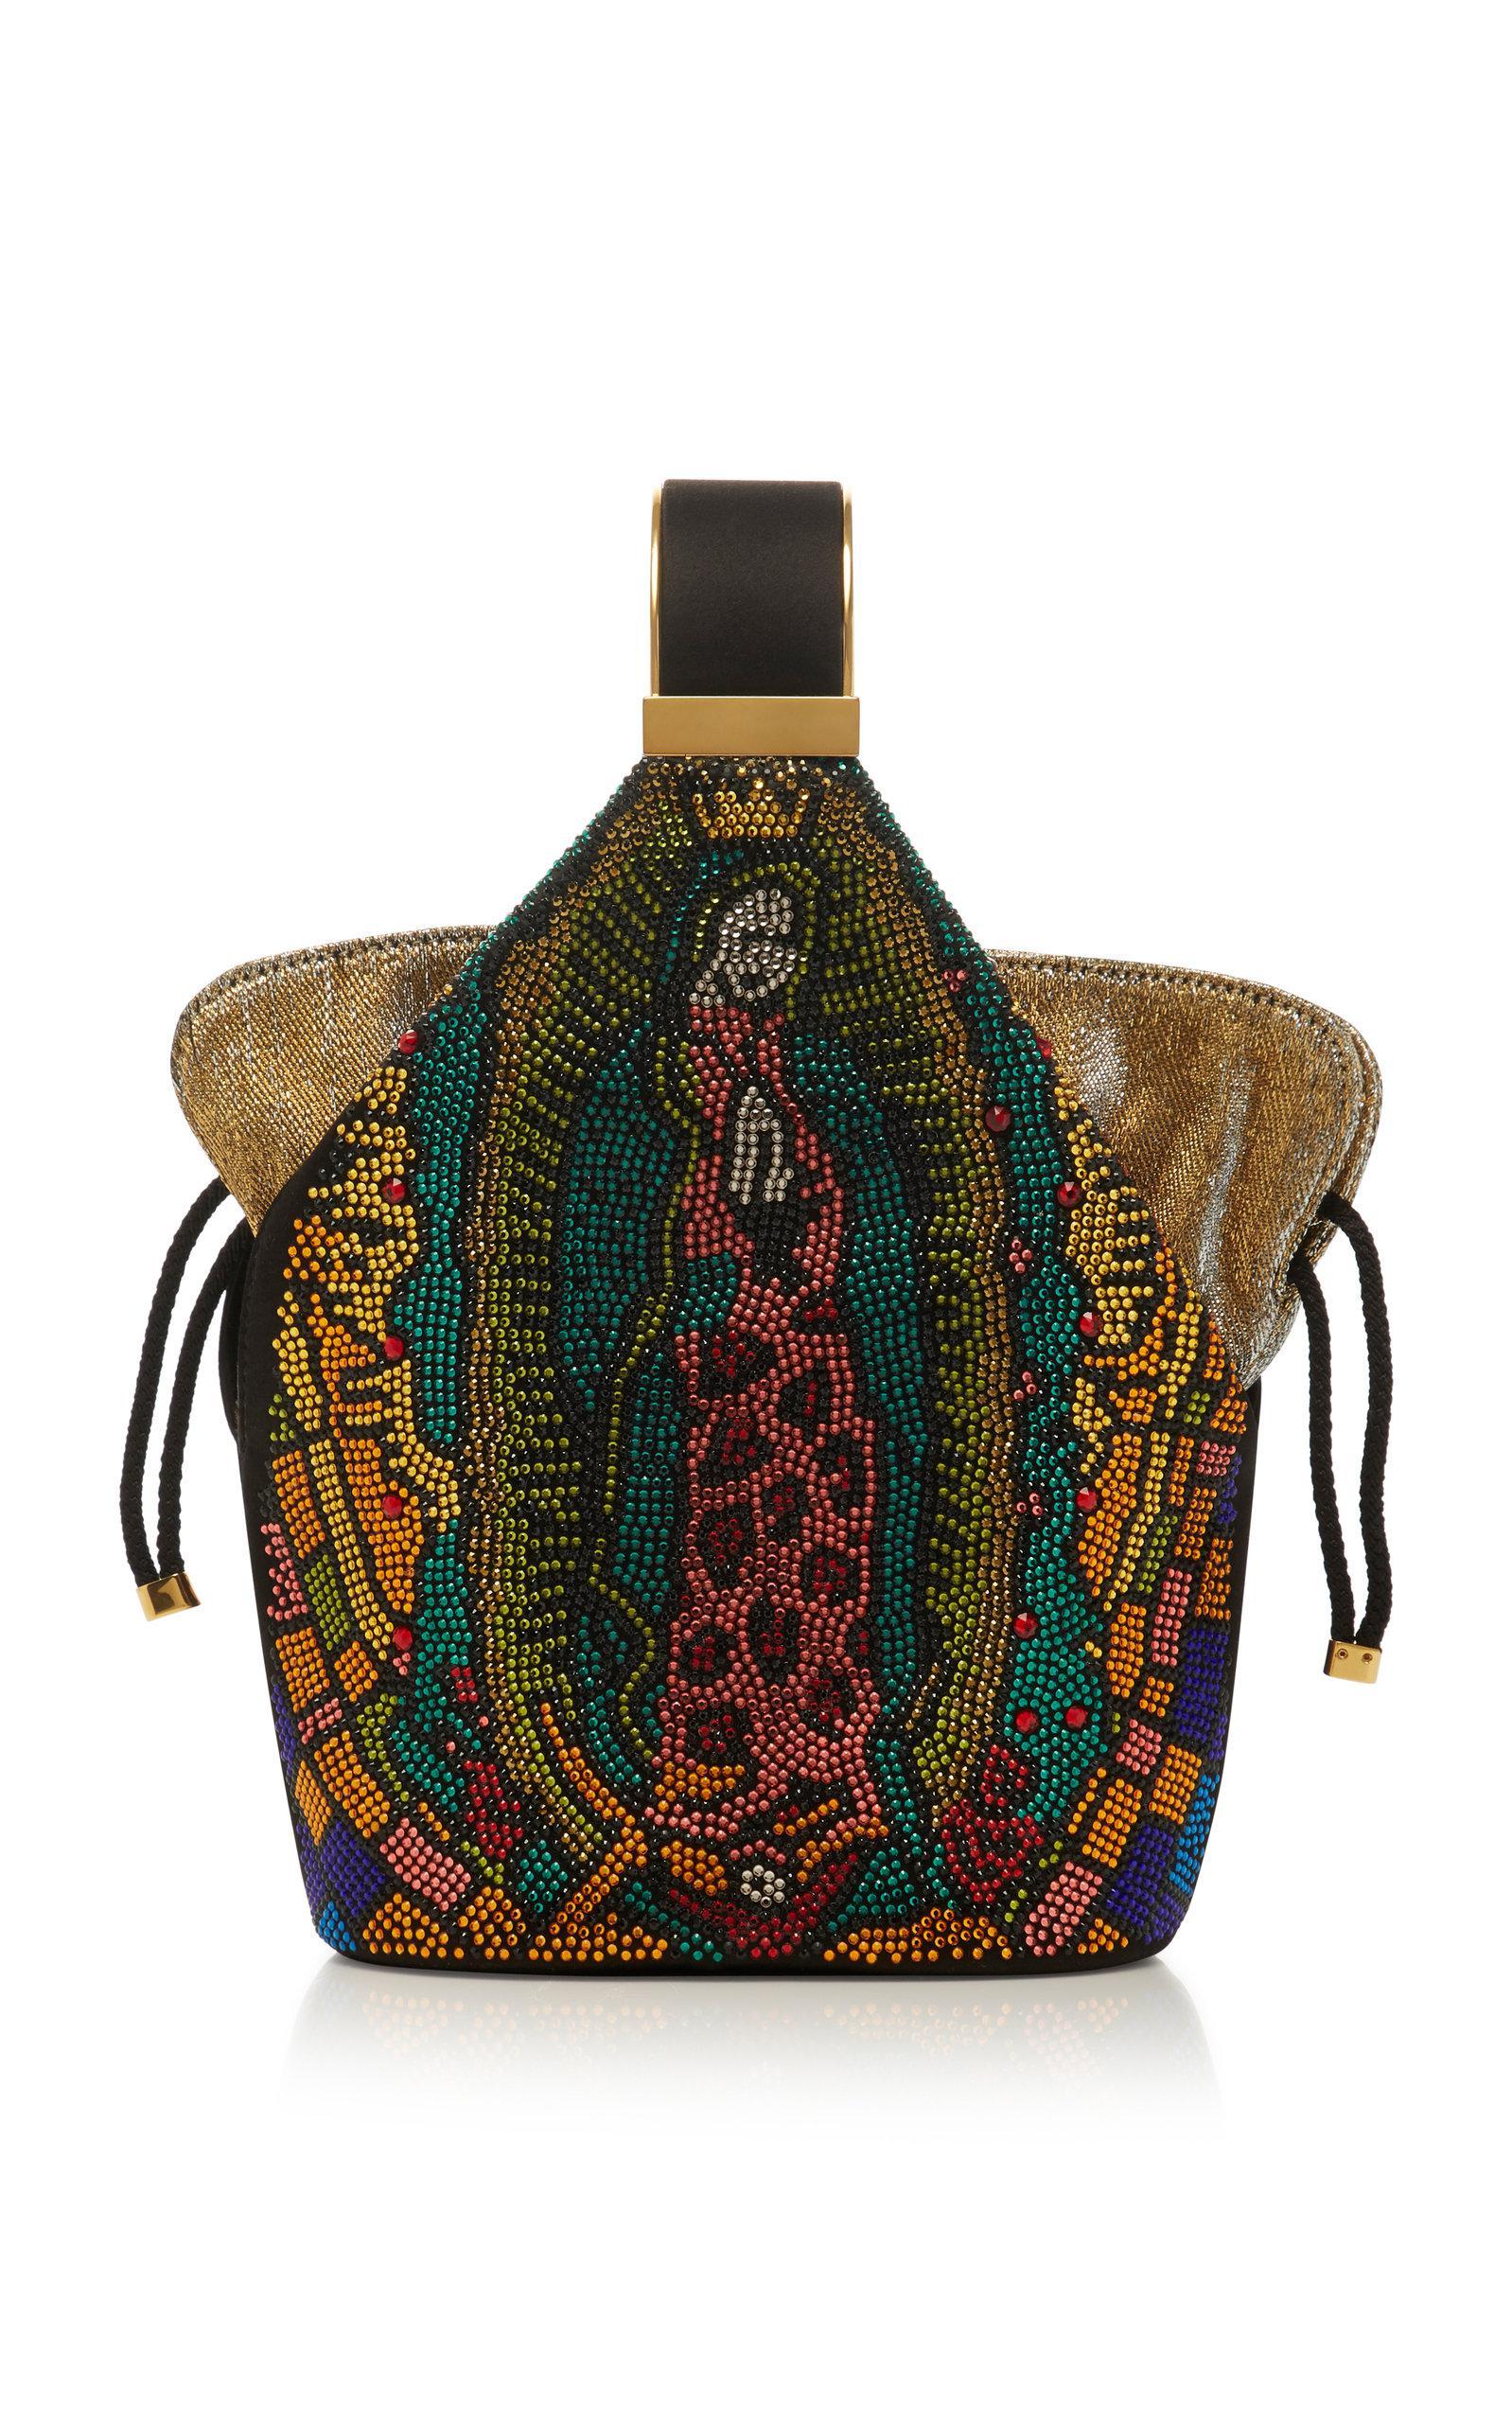 Bienen-Davis Our Lady of Guadalupe Kit Bracelet Bag 0lnEZ42U1F